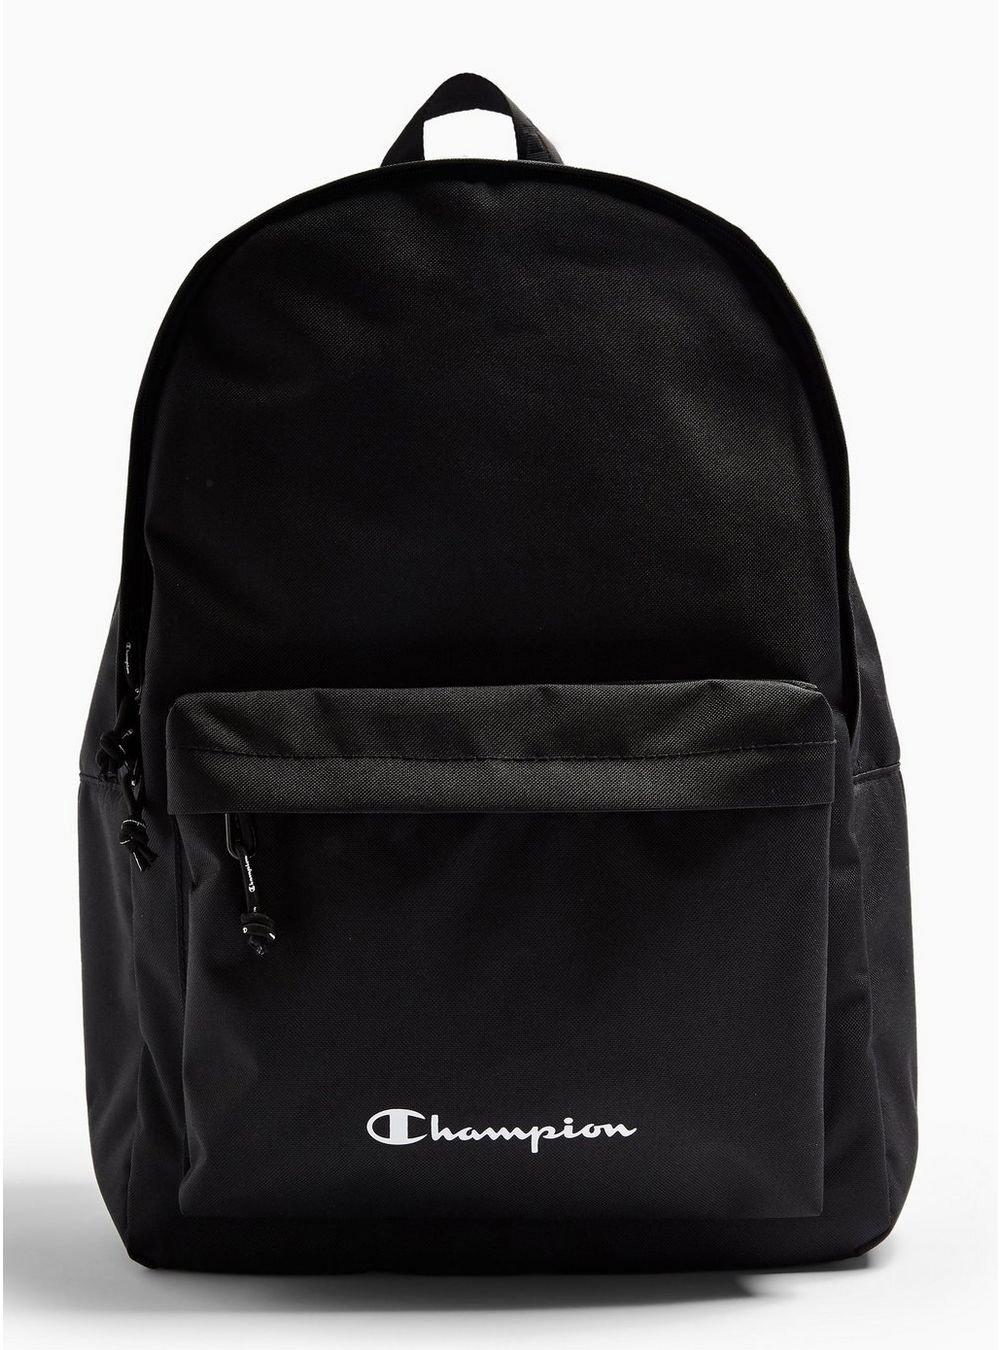 Champion Legacy Backpack - Black